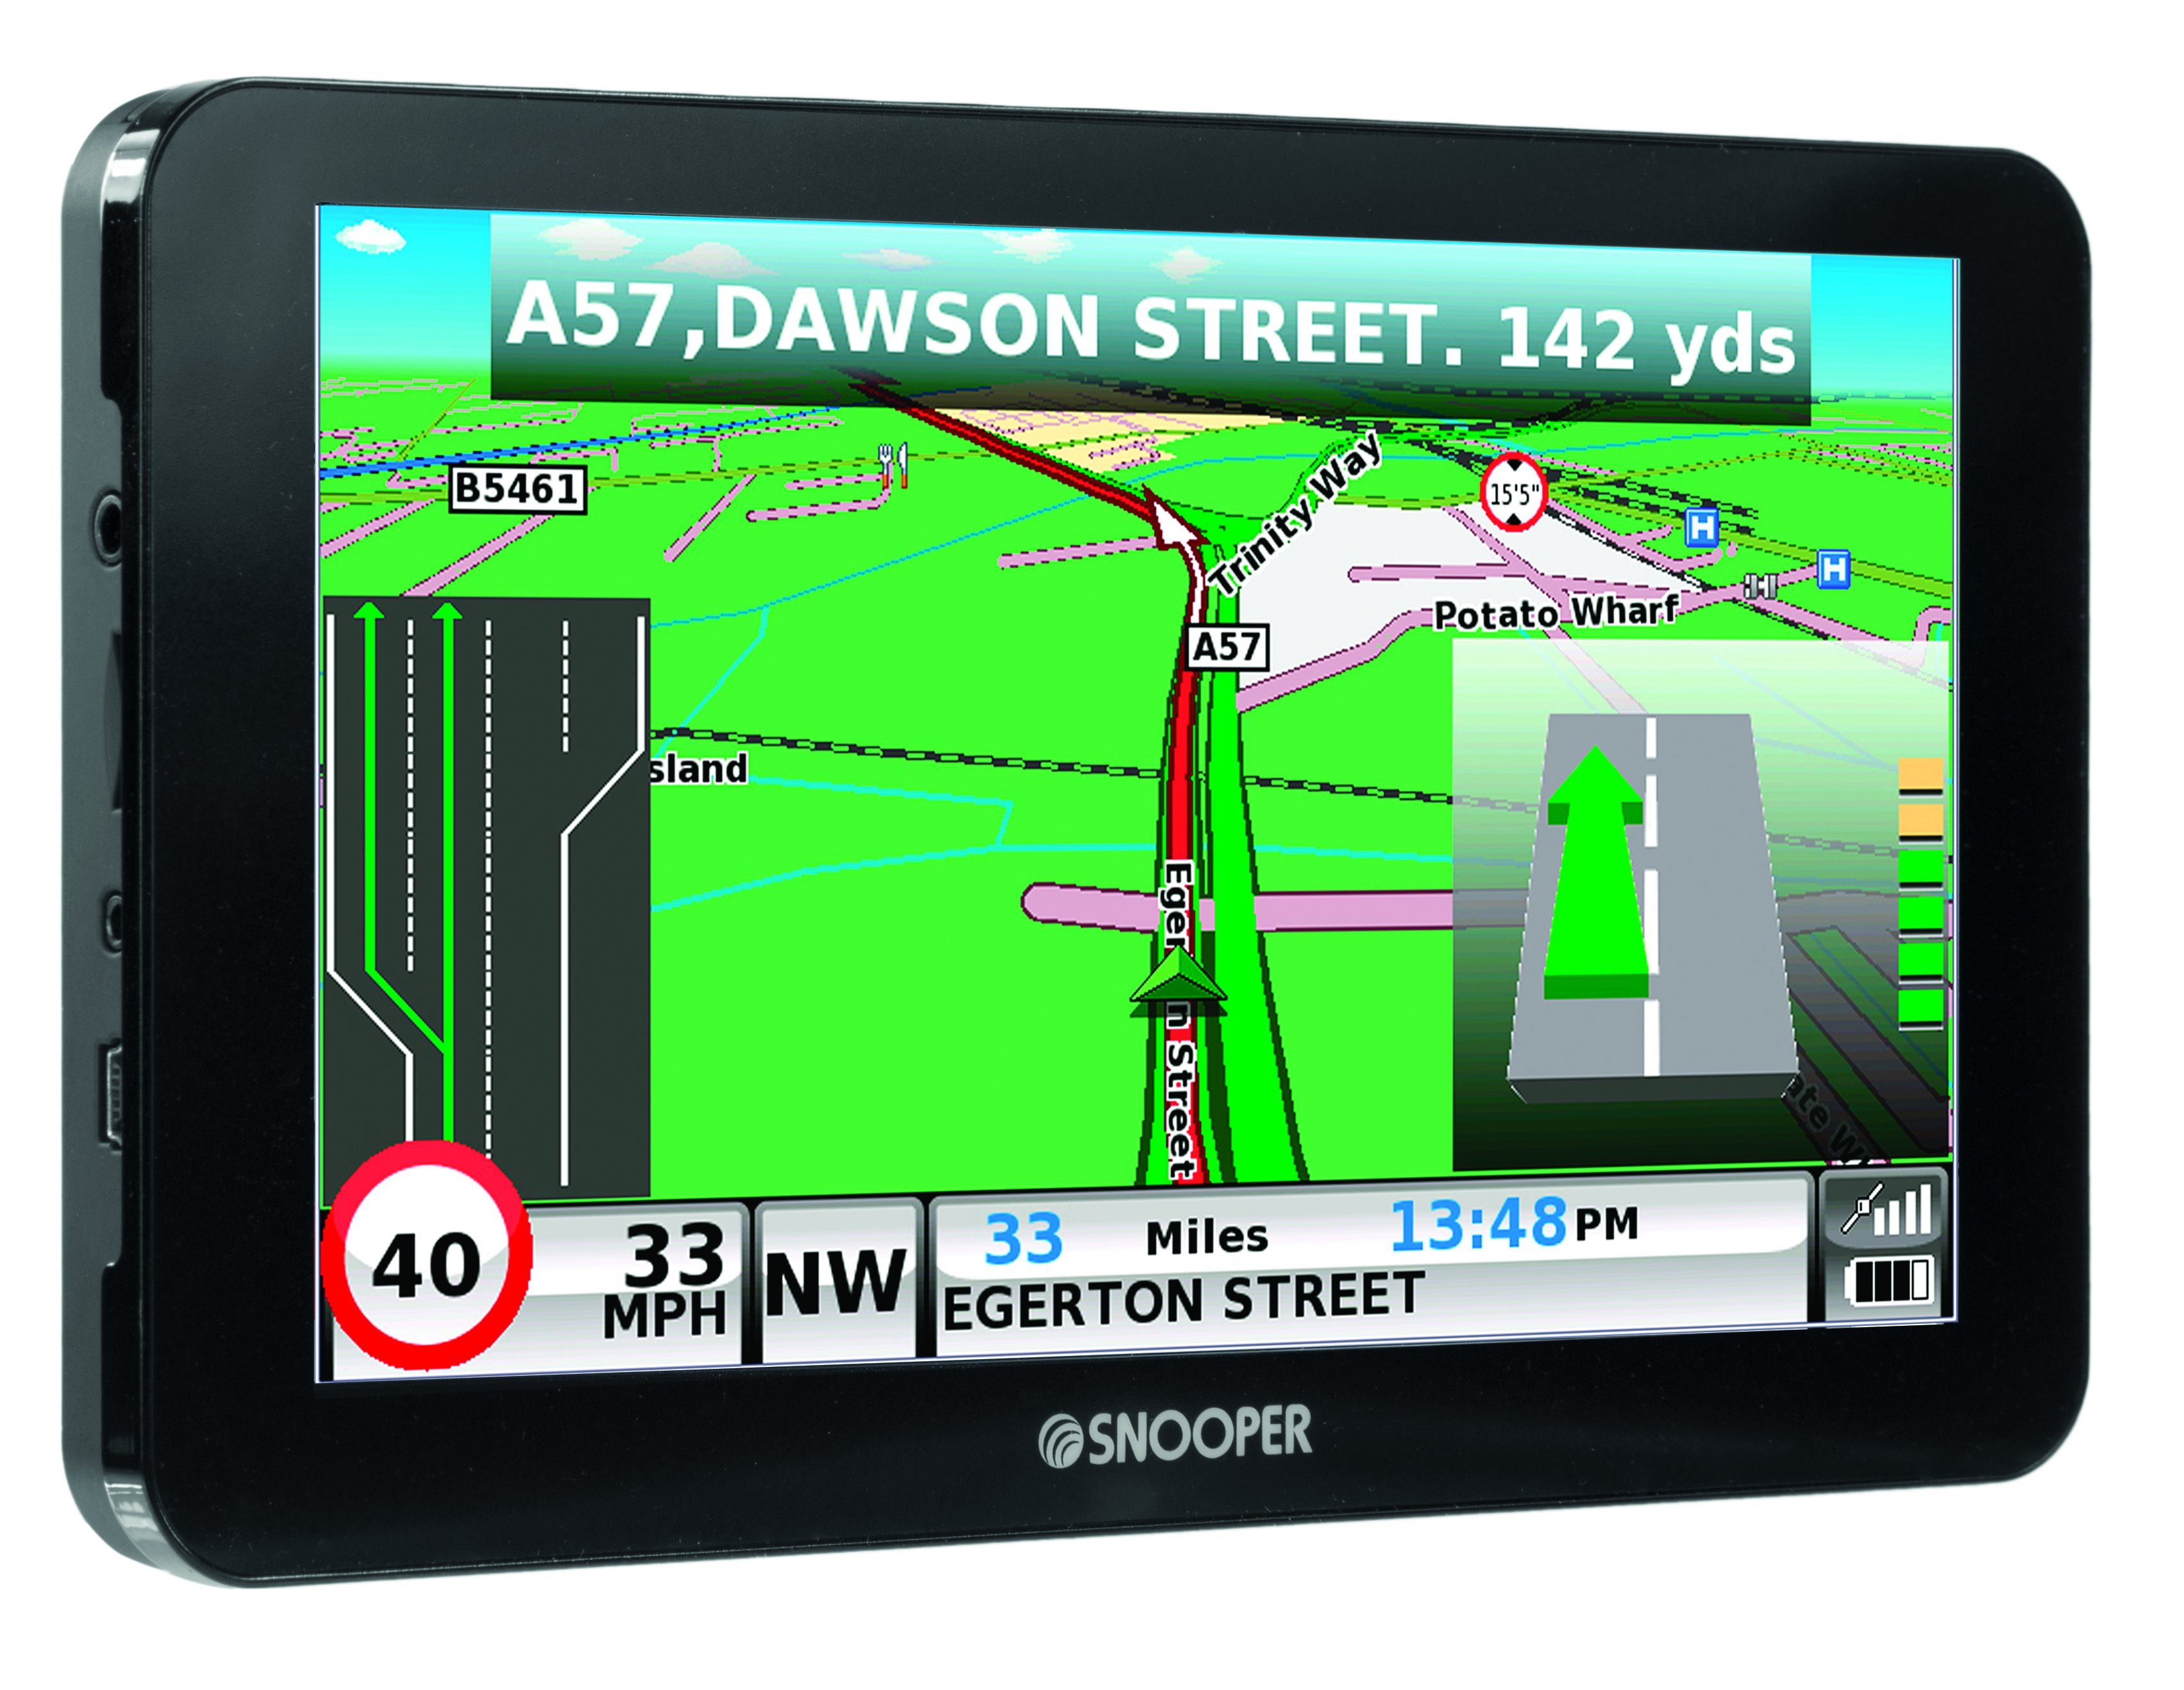 NEW Snooper Truckmate PRO S GPS TruckHGV Sat Nav European - Gps mapping system